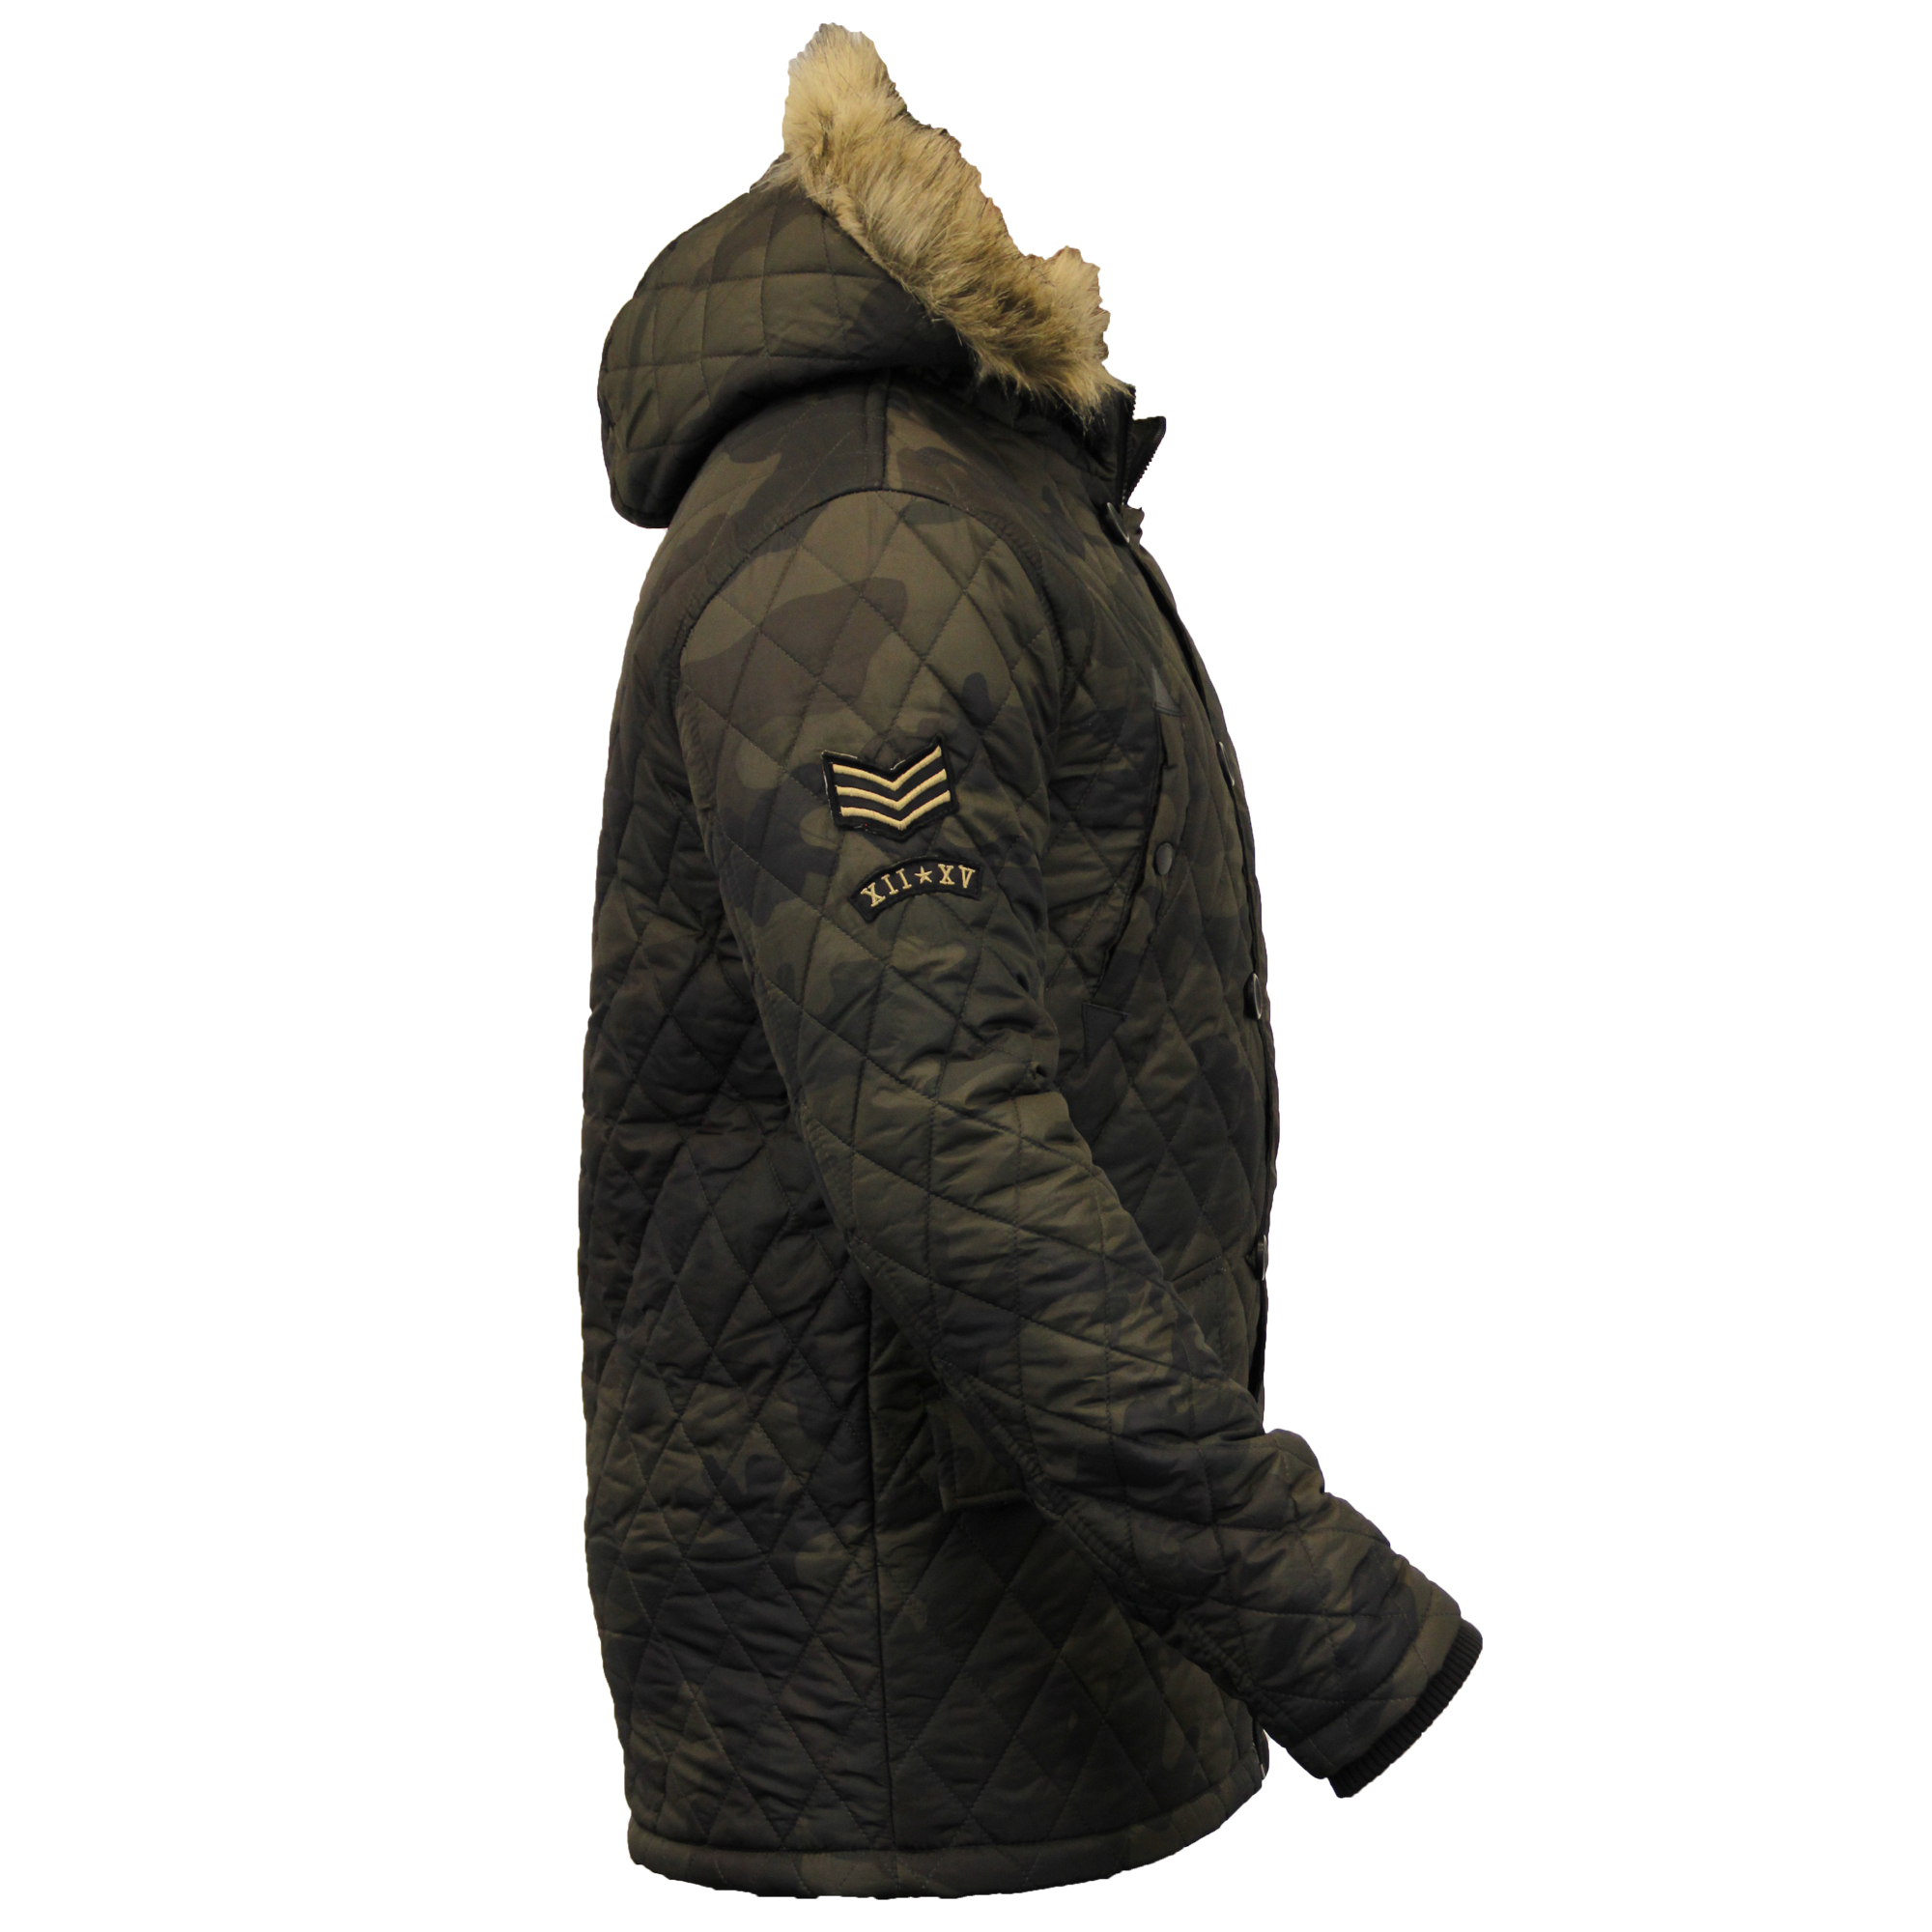 homme matelass insigne parka brave soul manteau camouflage sherpa polaire rembourr capuche. Black Bedroom Furniture Sets. Home Design Ideas